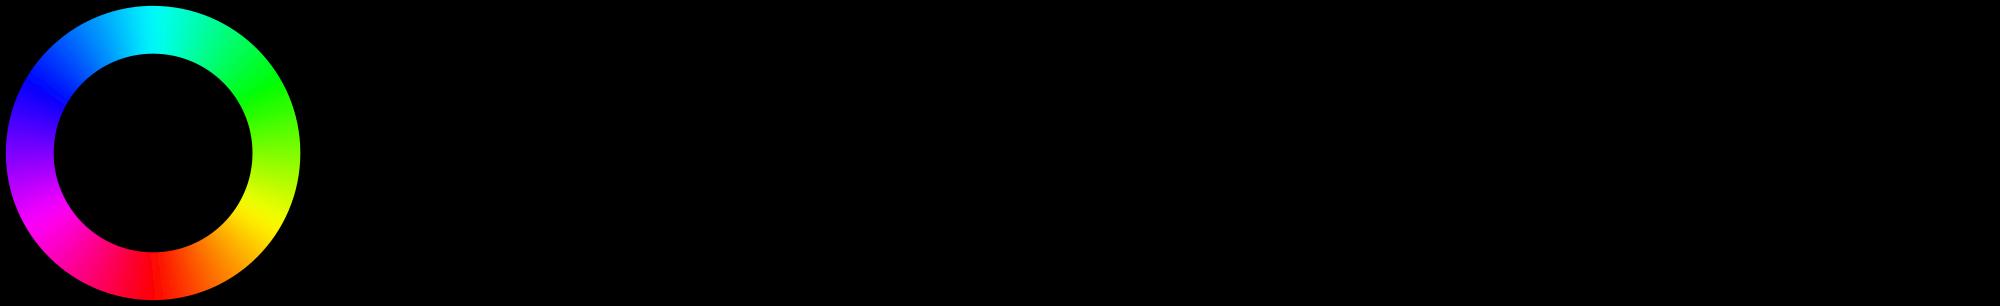 biasHybrid